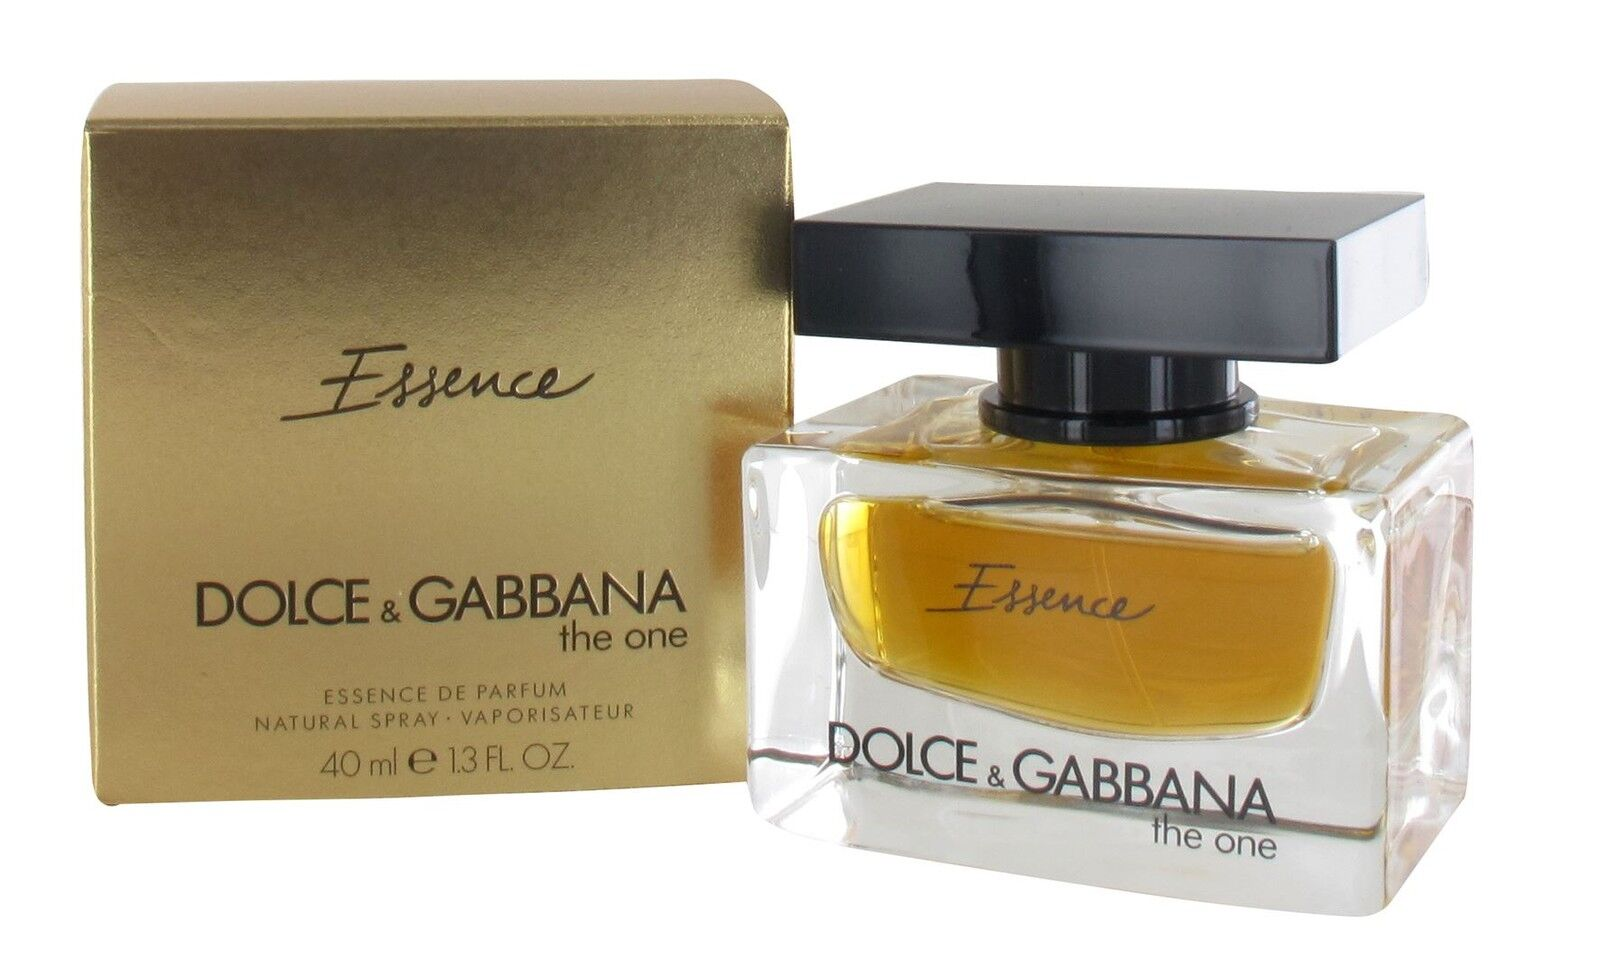 Dolce   Gabbana The One Essence EDP Eau De Parfum Spray 40ml - 3x   eBay 1d87640fa0fd